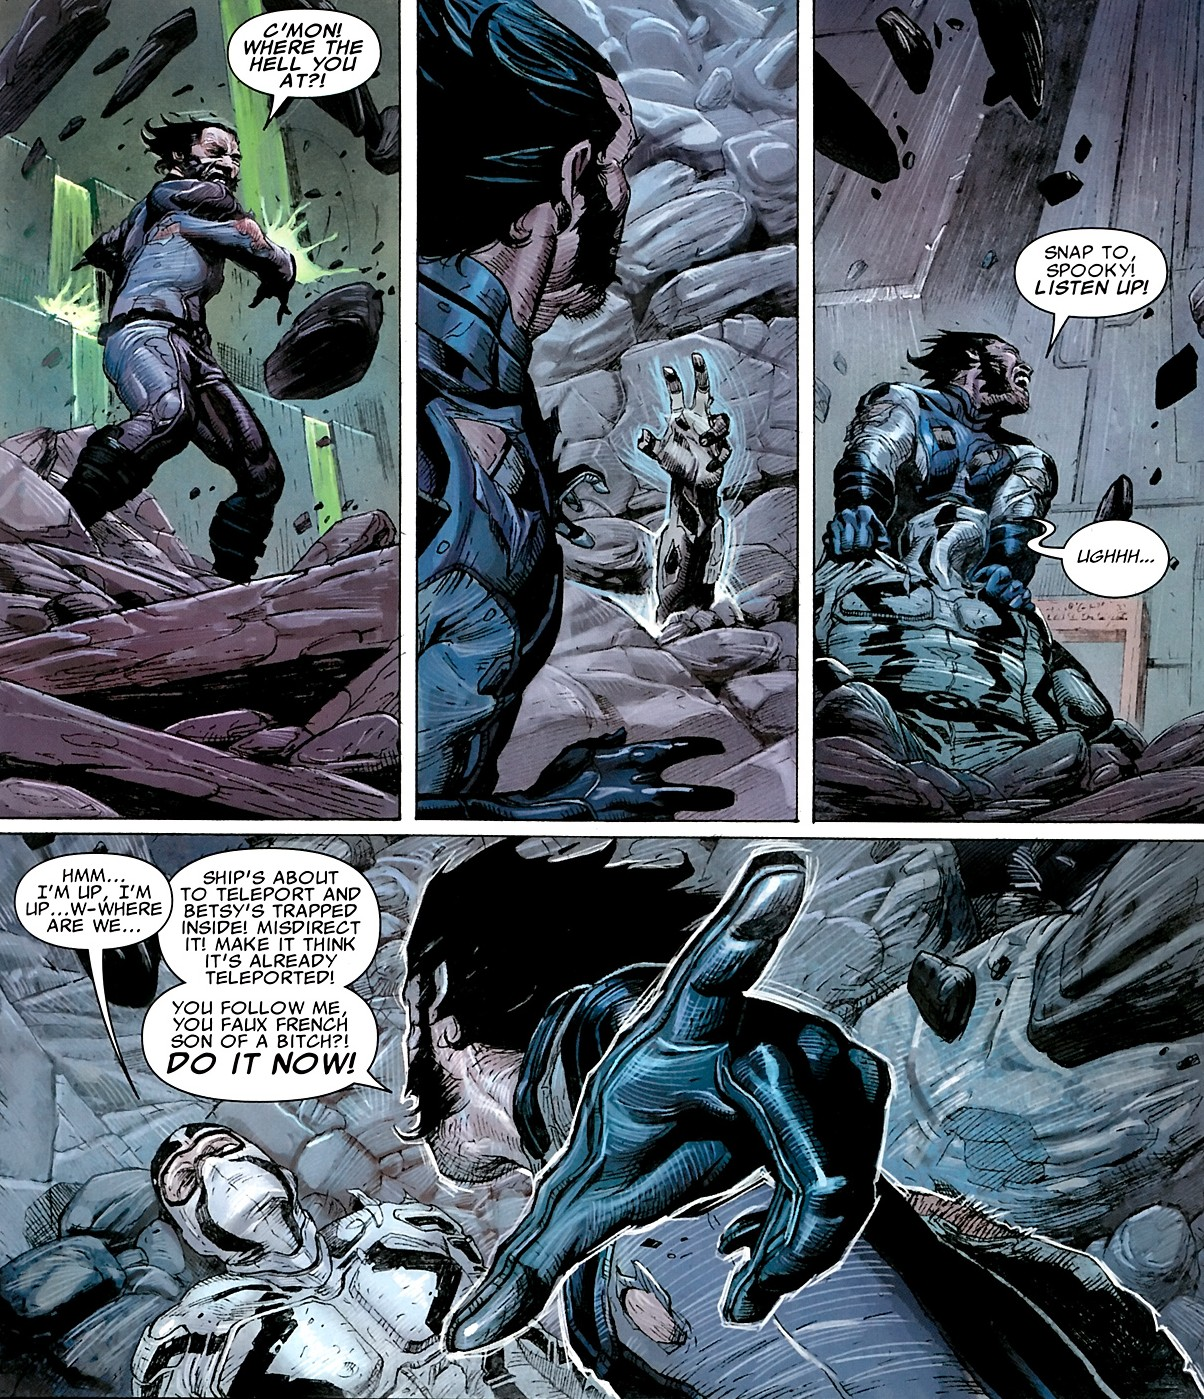 X-men Supreme: Uncanny X-Force #4 - A+ Awesome